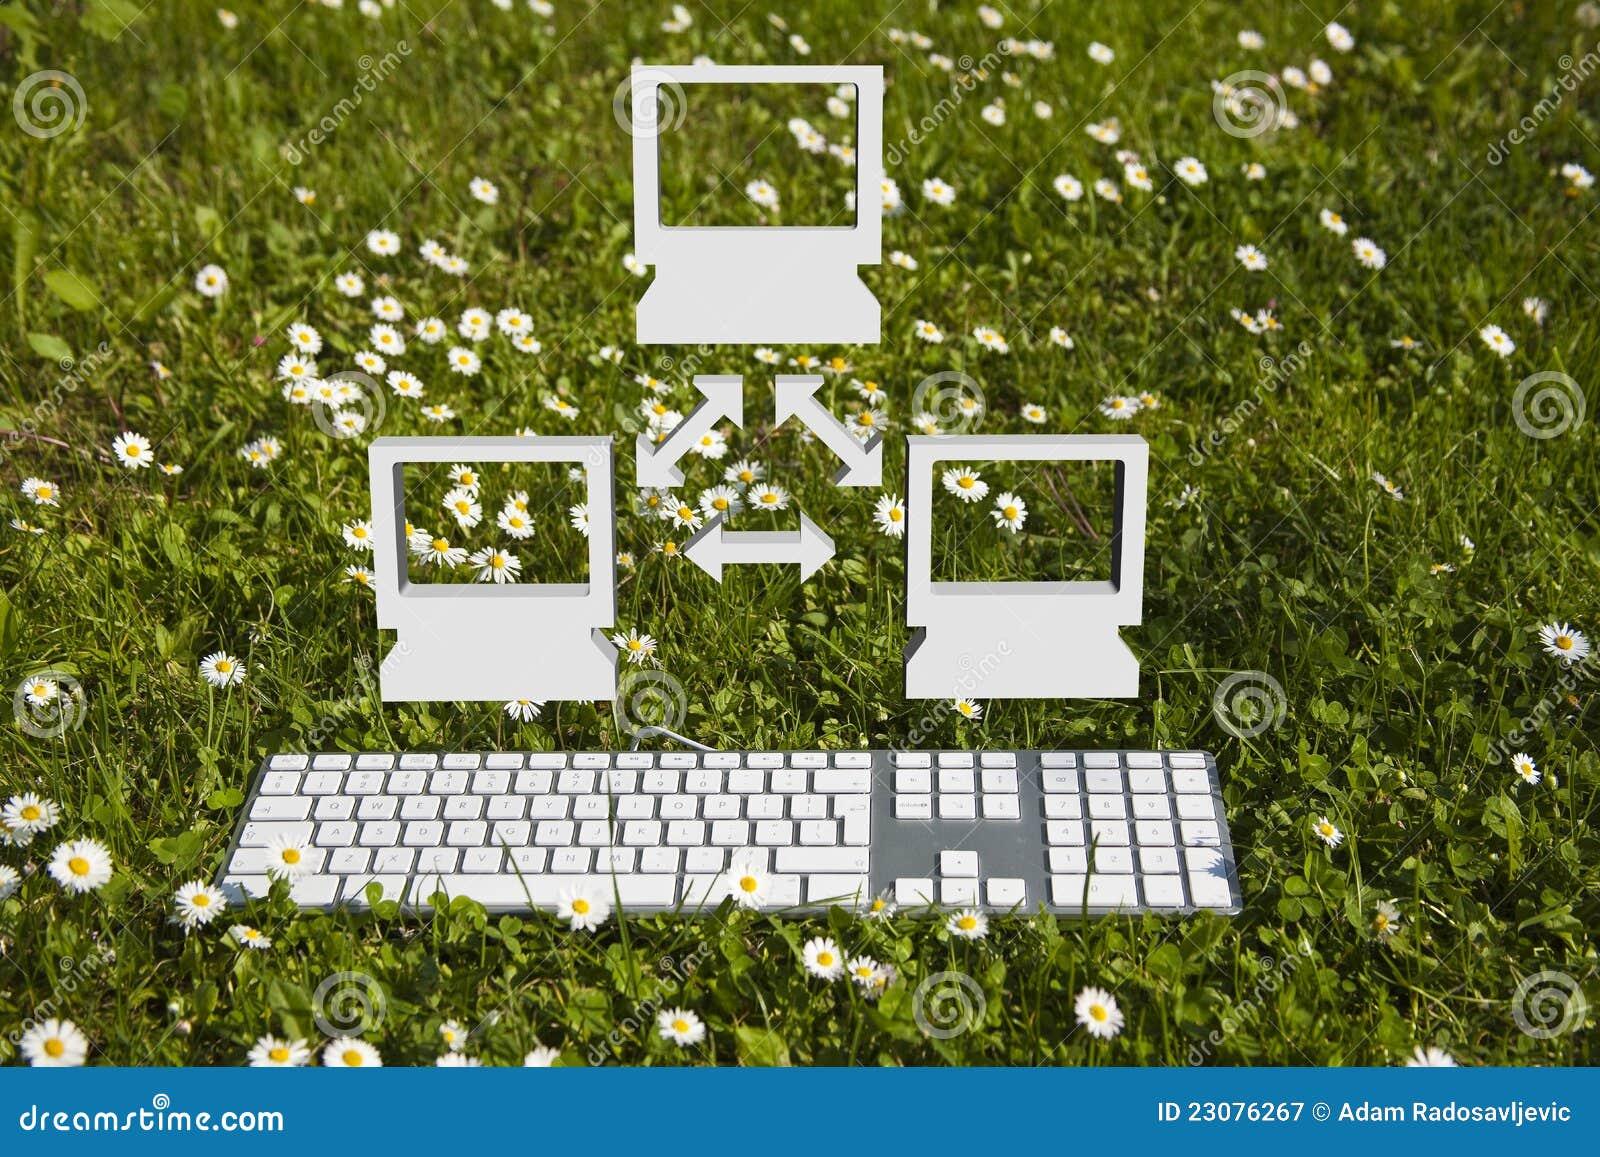 Beautiful Small Computer Network In Garden